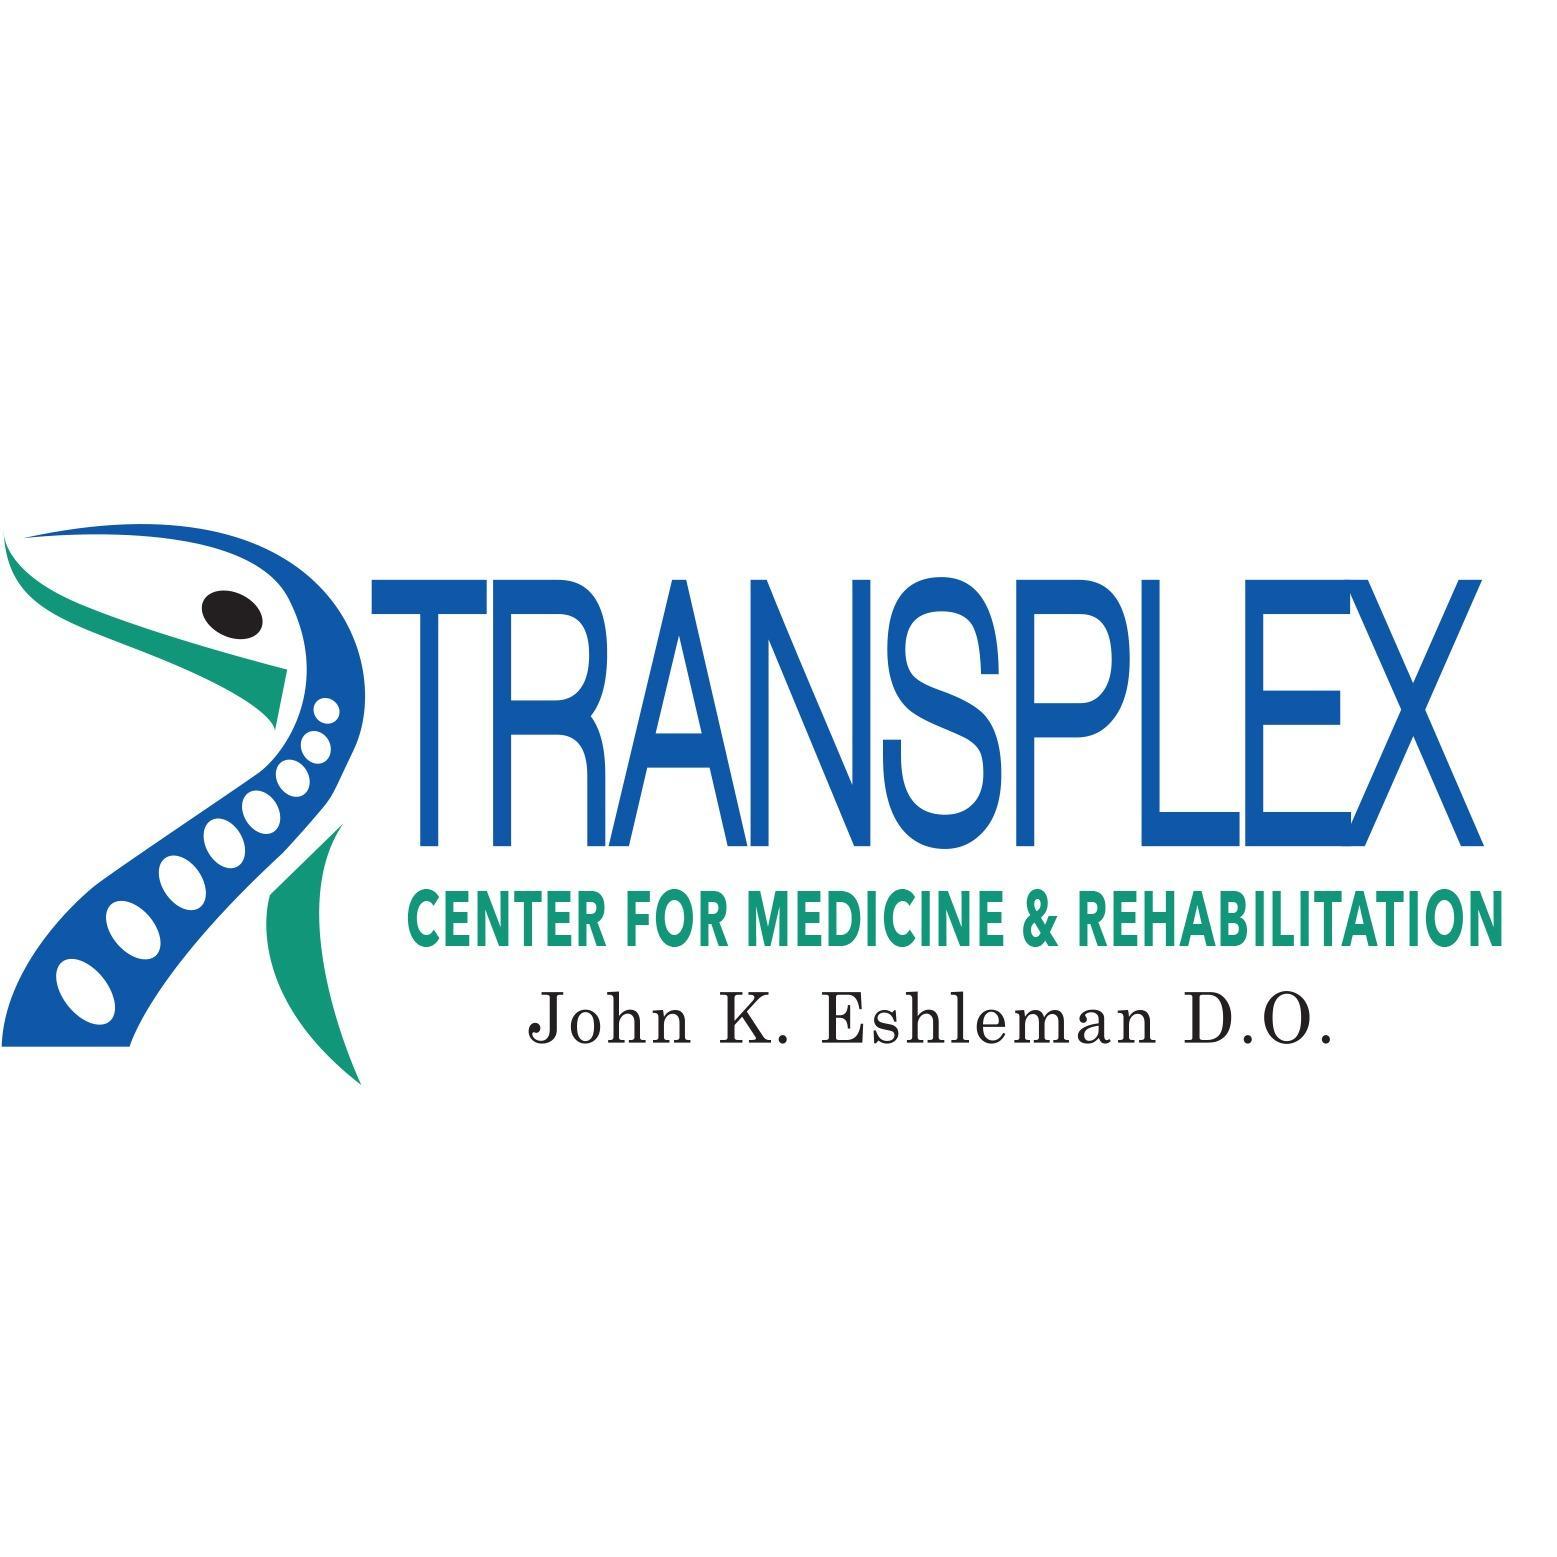 Transplex Centers For Medicine & Rehabiitation